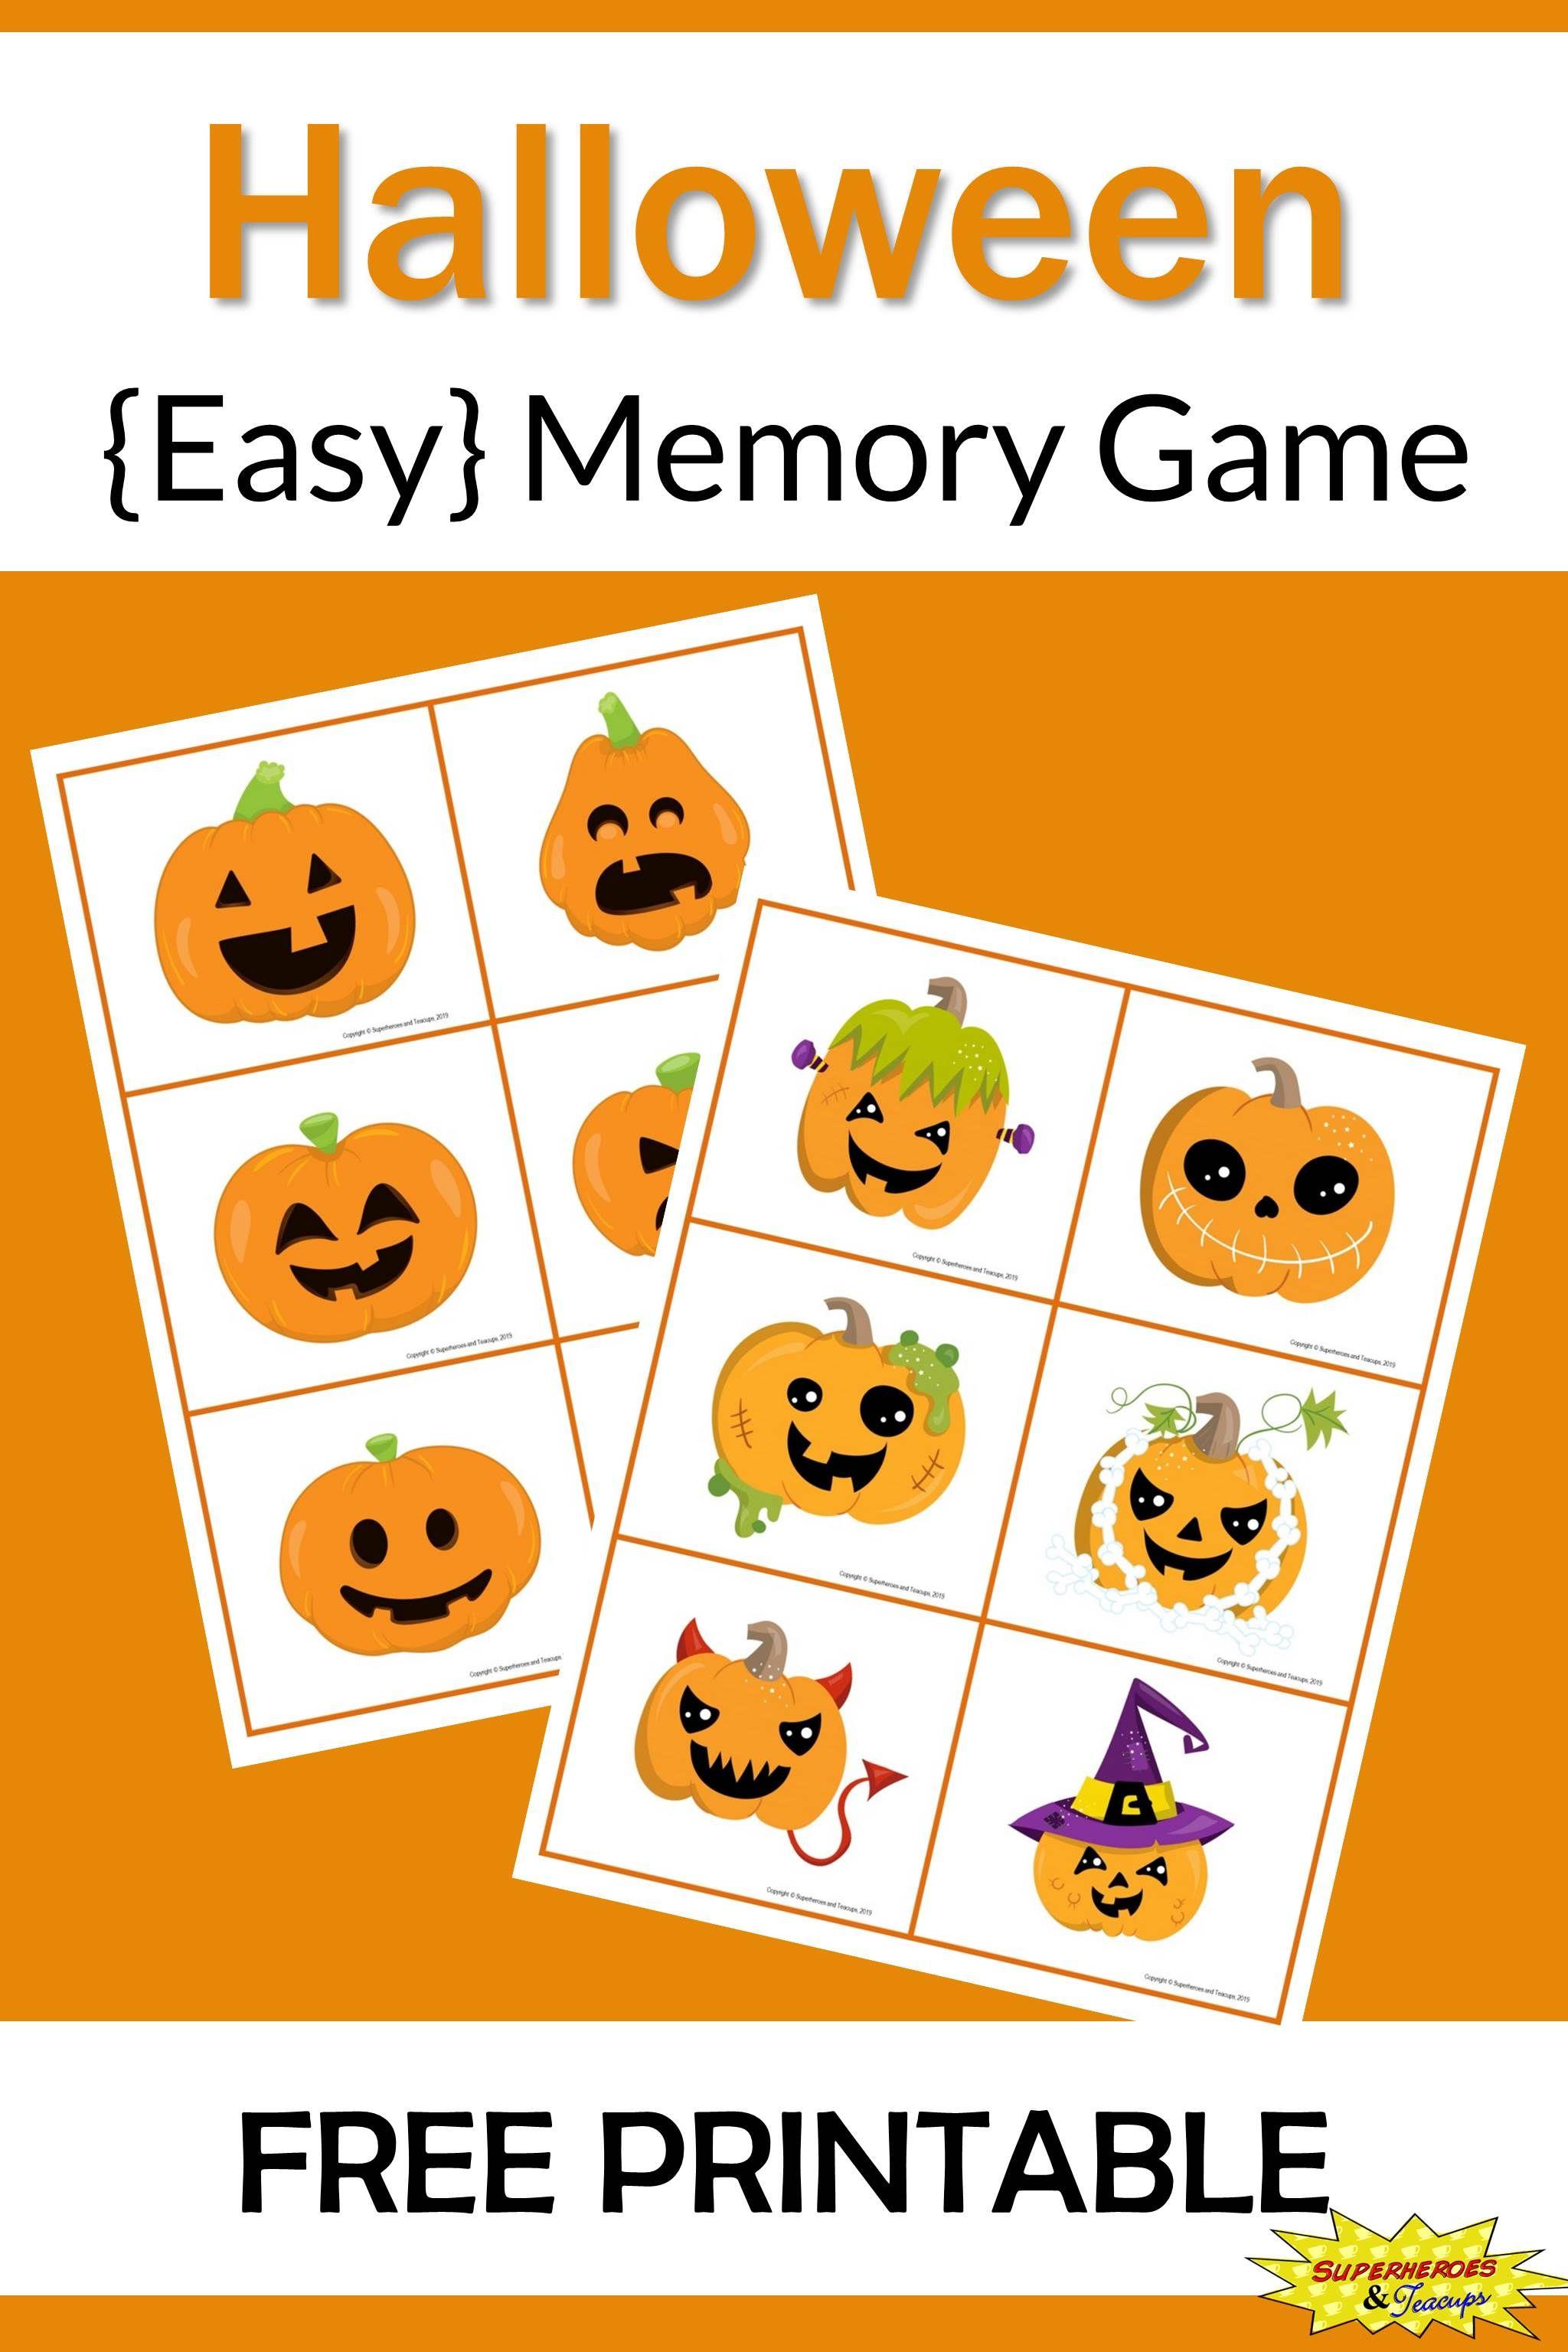 Halloween Memory Game Free Printable Fun printables for